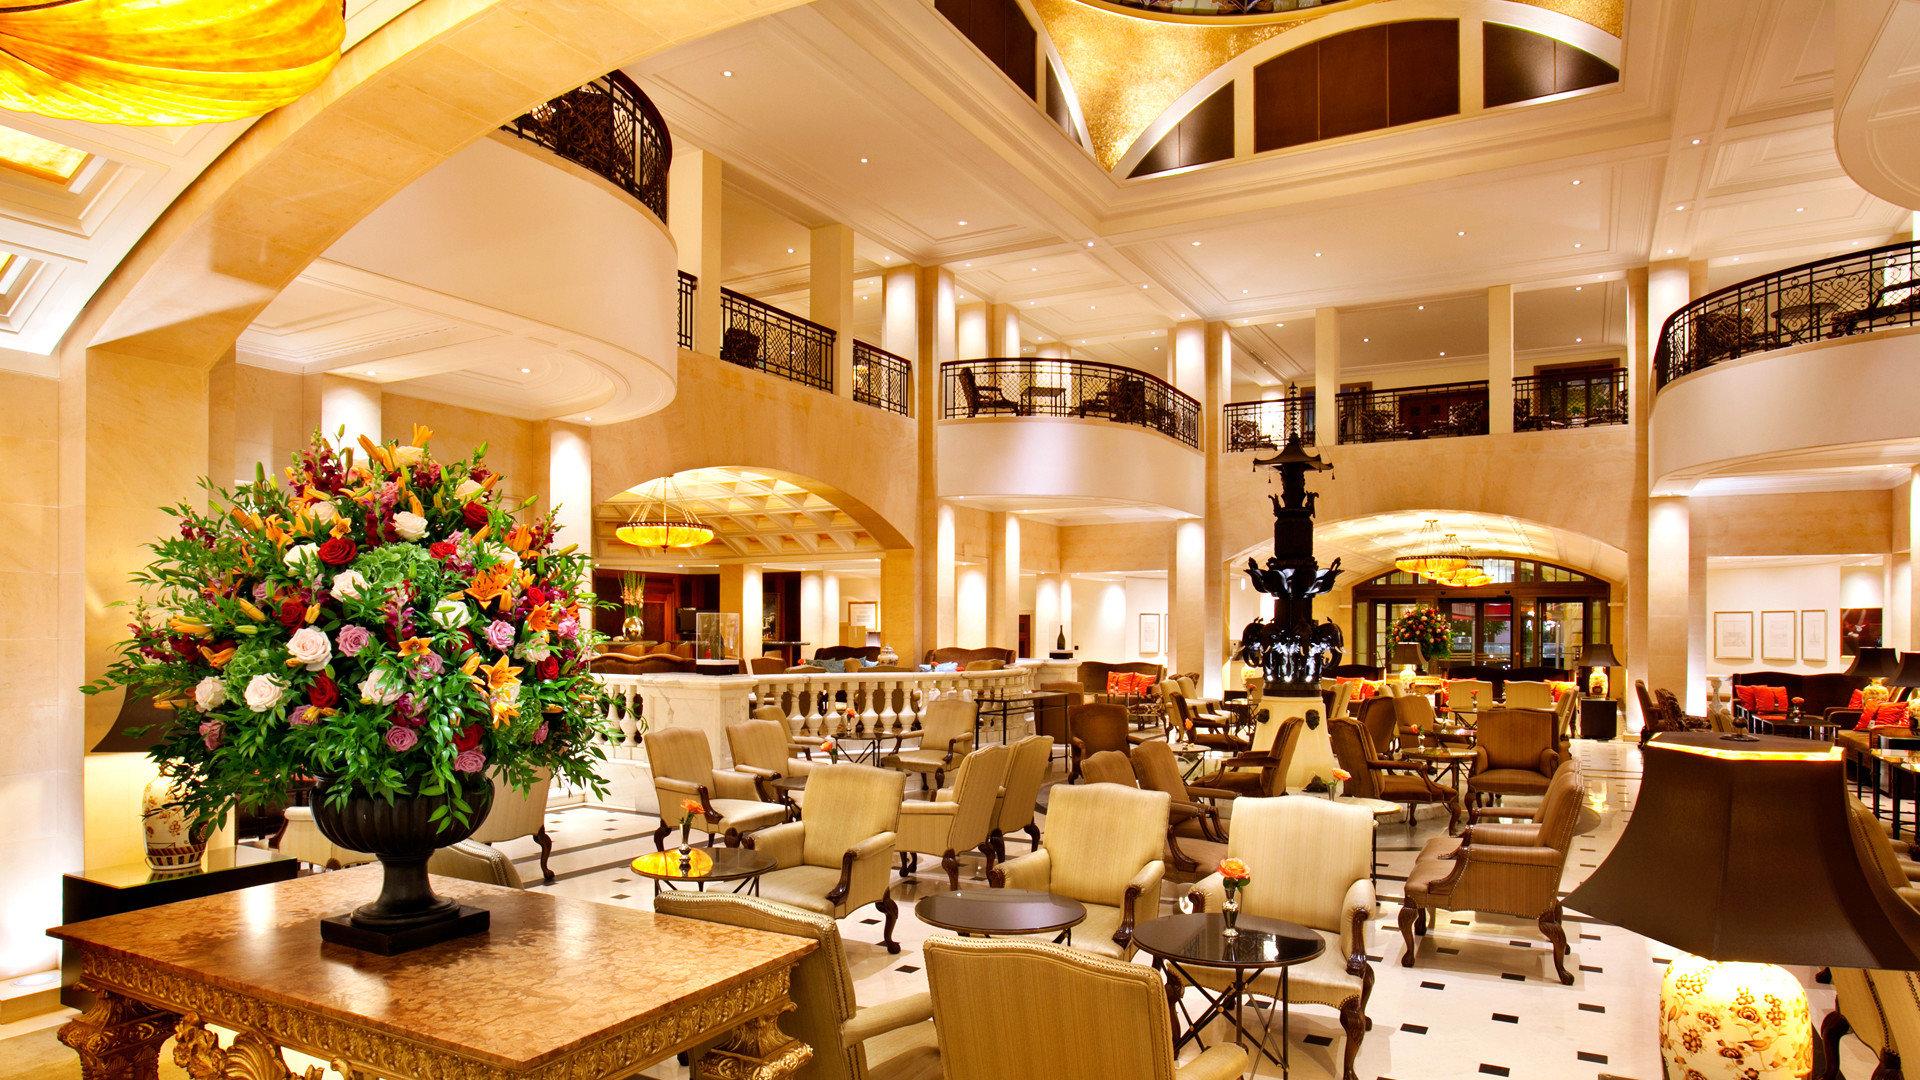 Lobby Lounge Dining restaurant home